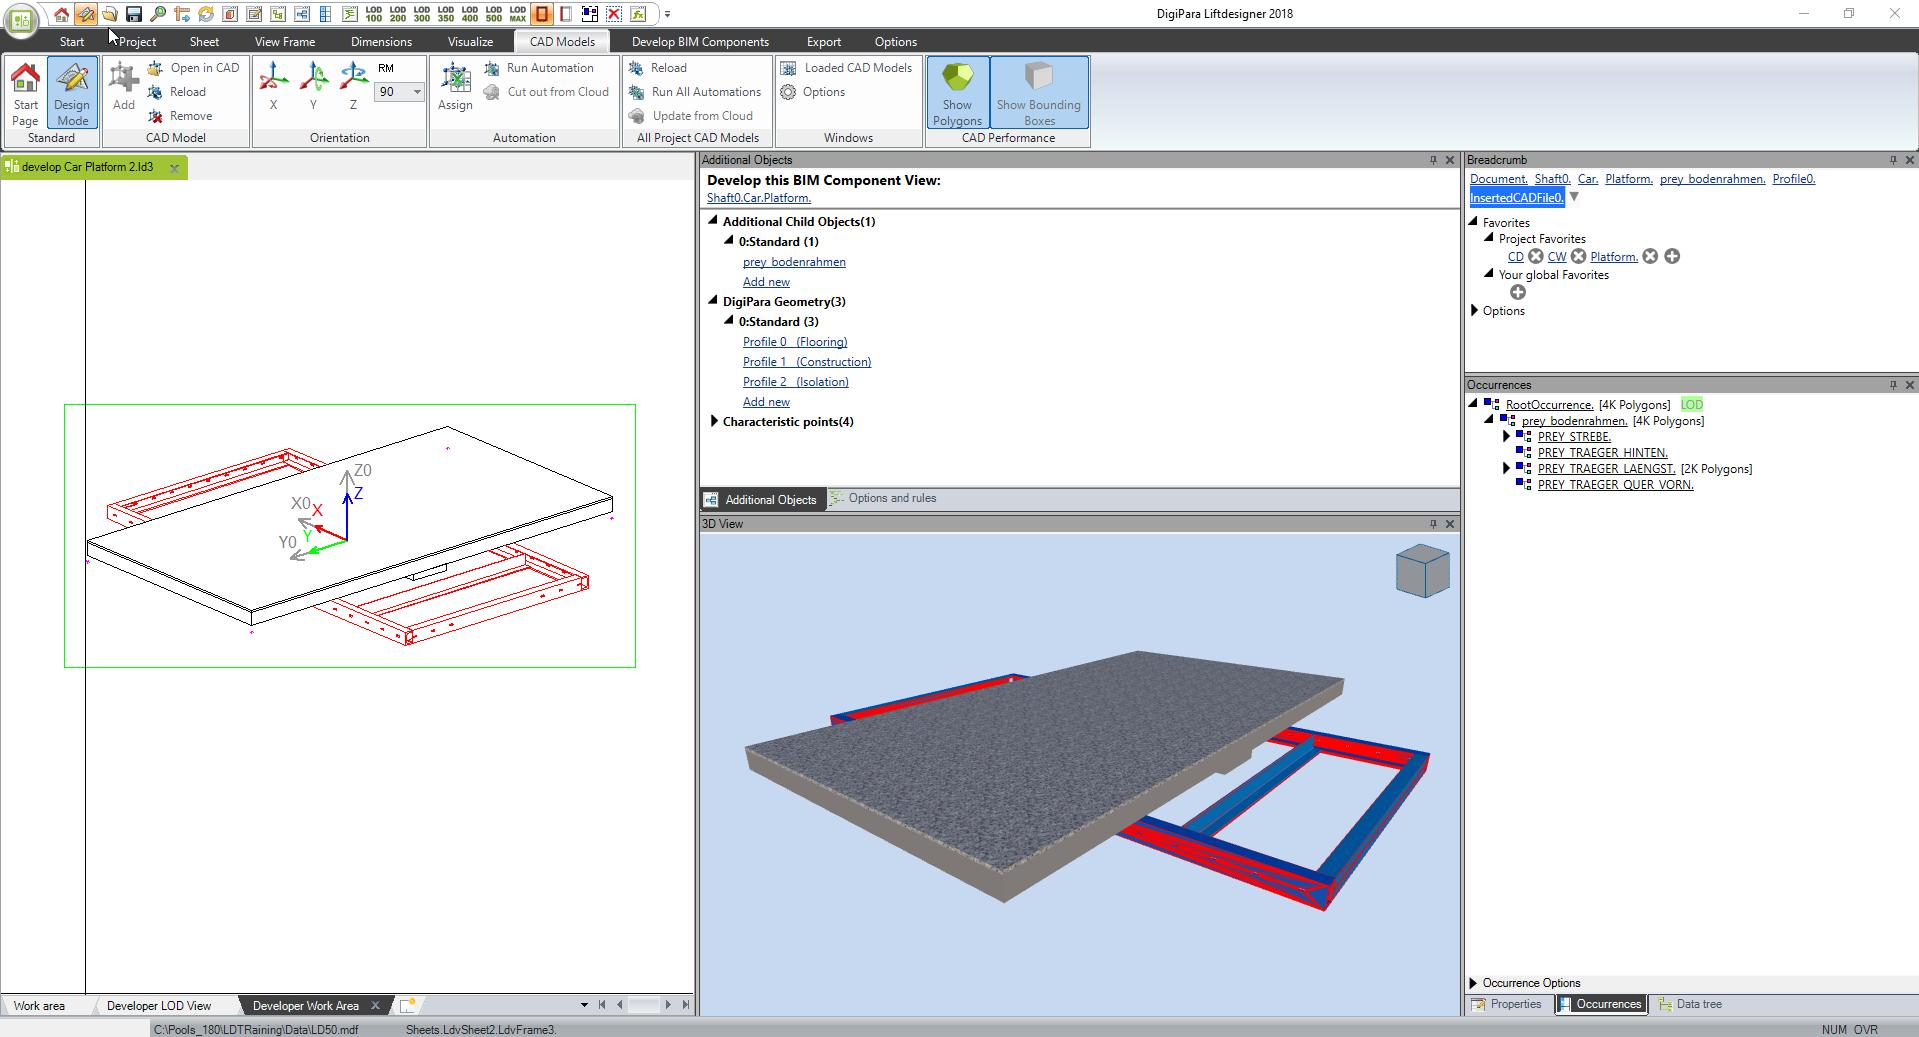 Building a DigiPara 3D BIM Component from a CREO CAD Model